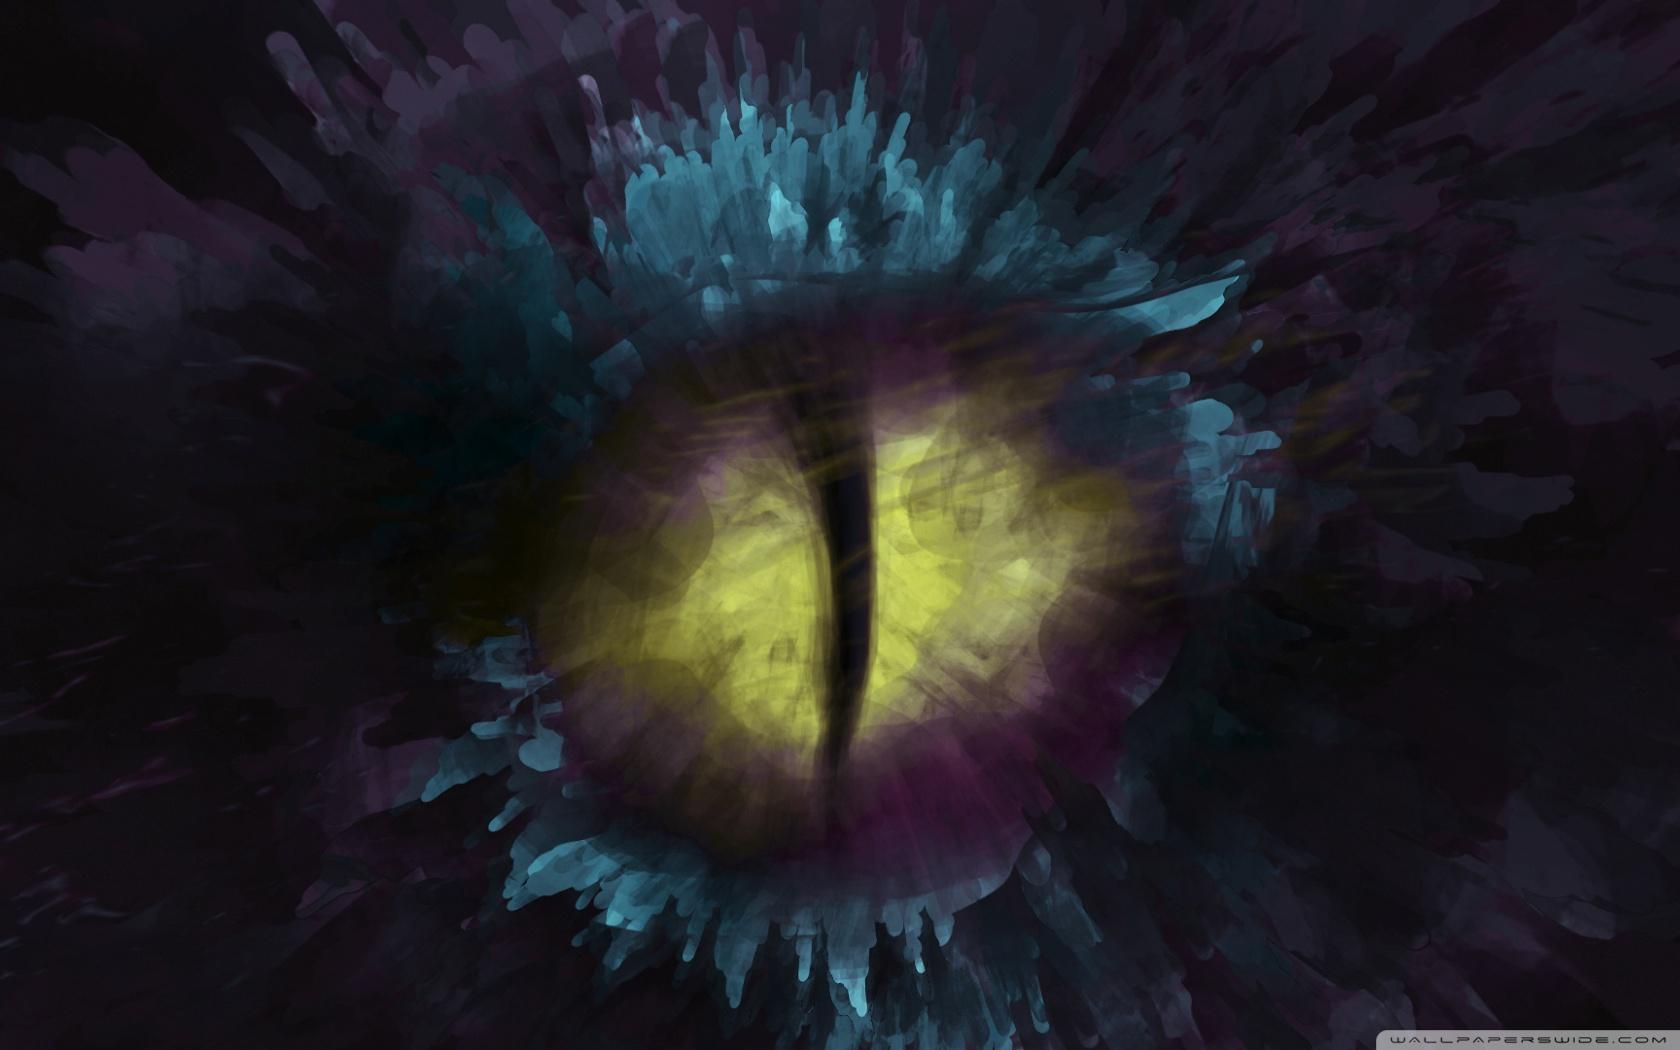 The Dragons Eye One phone wallpaper by supakorn 1680x1050